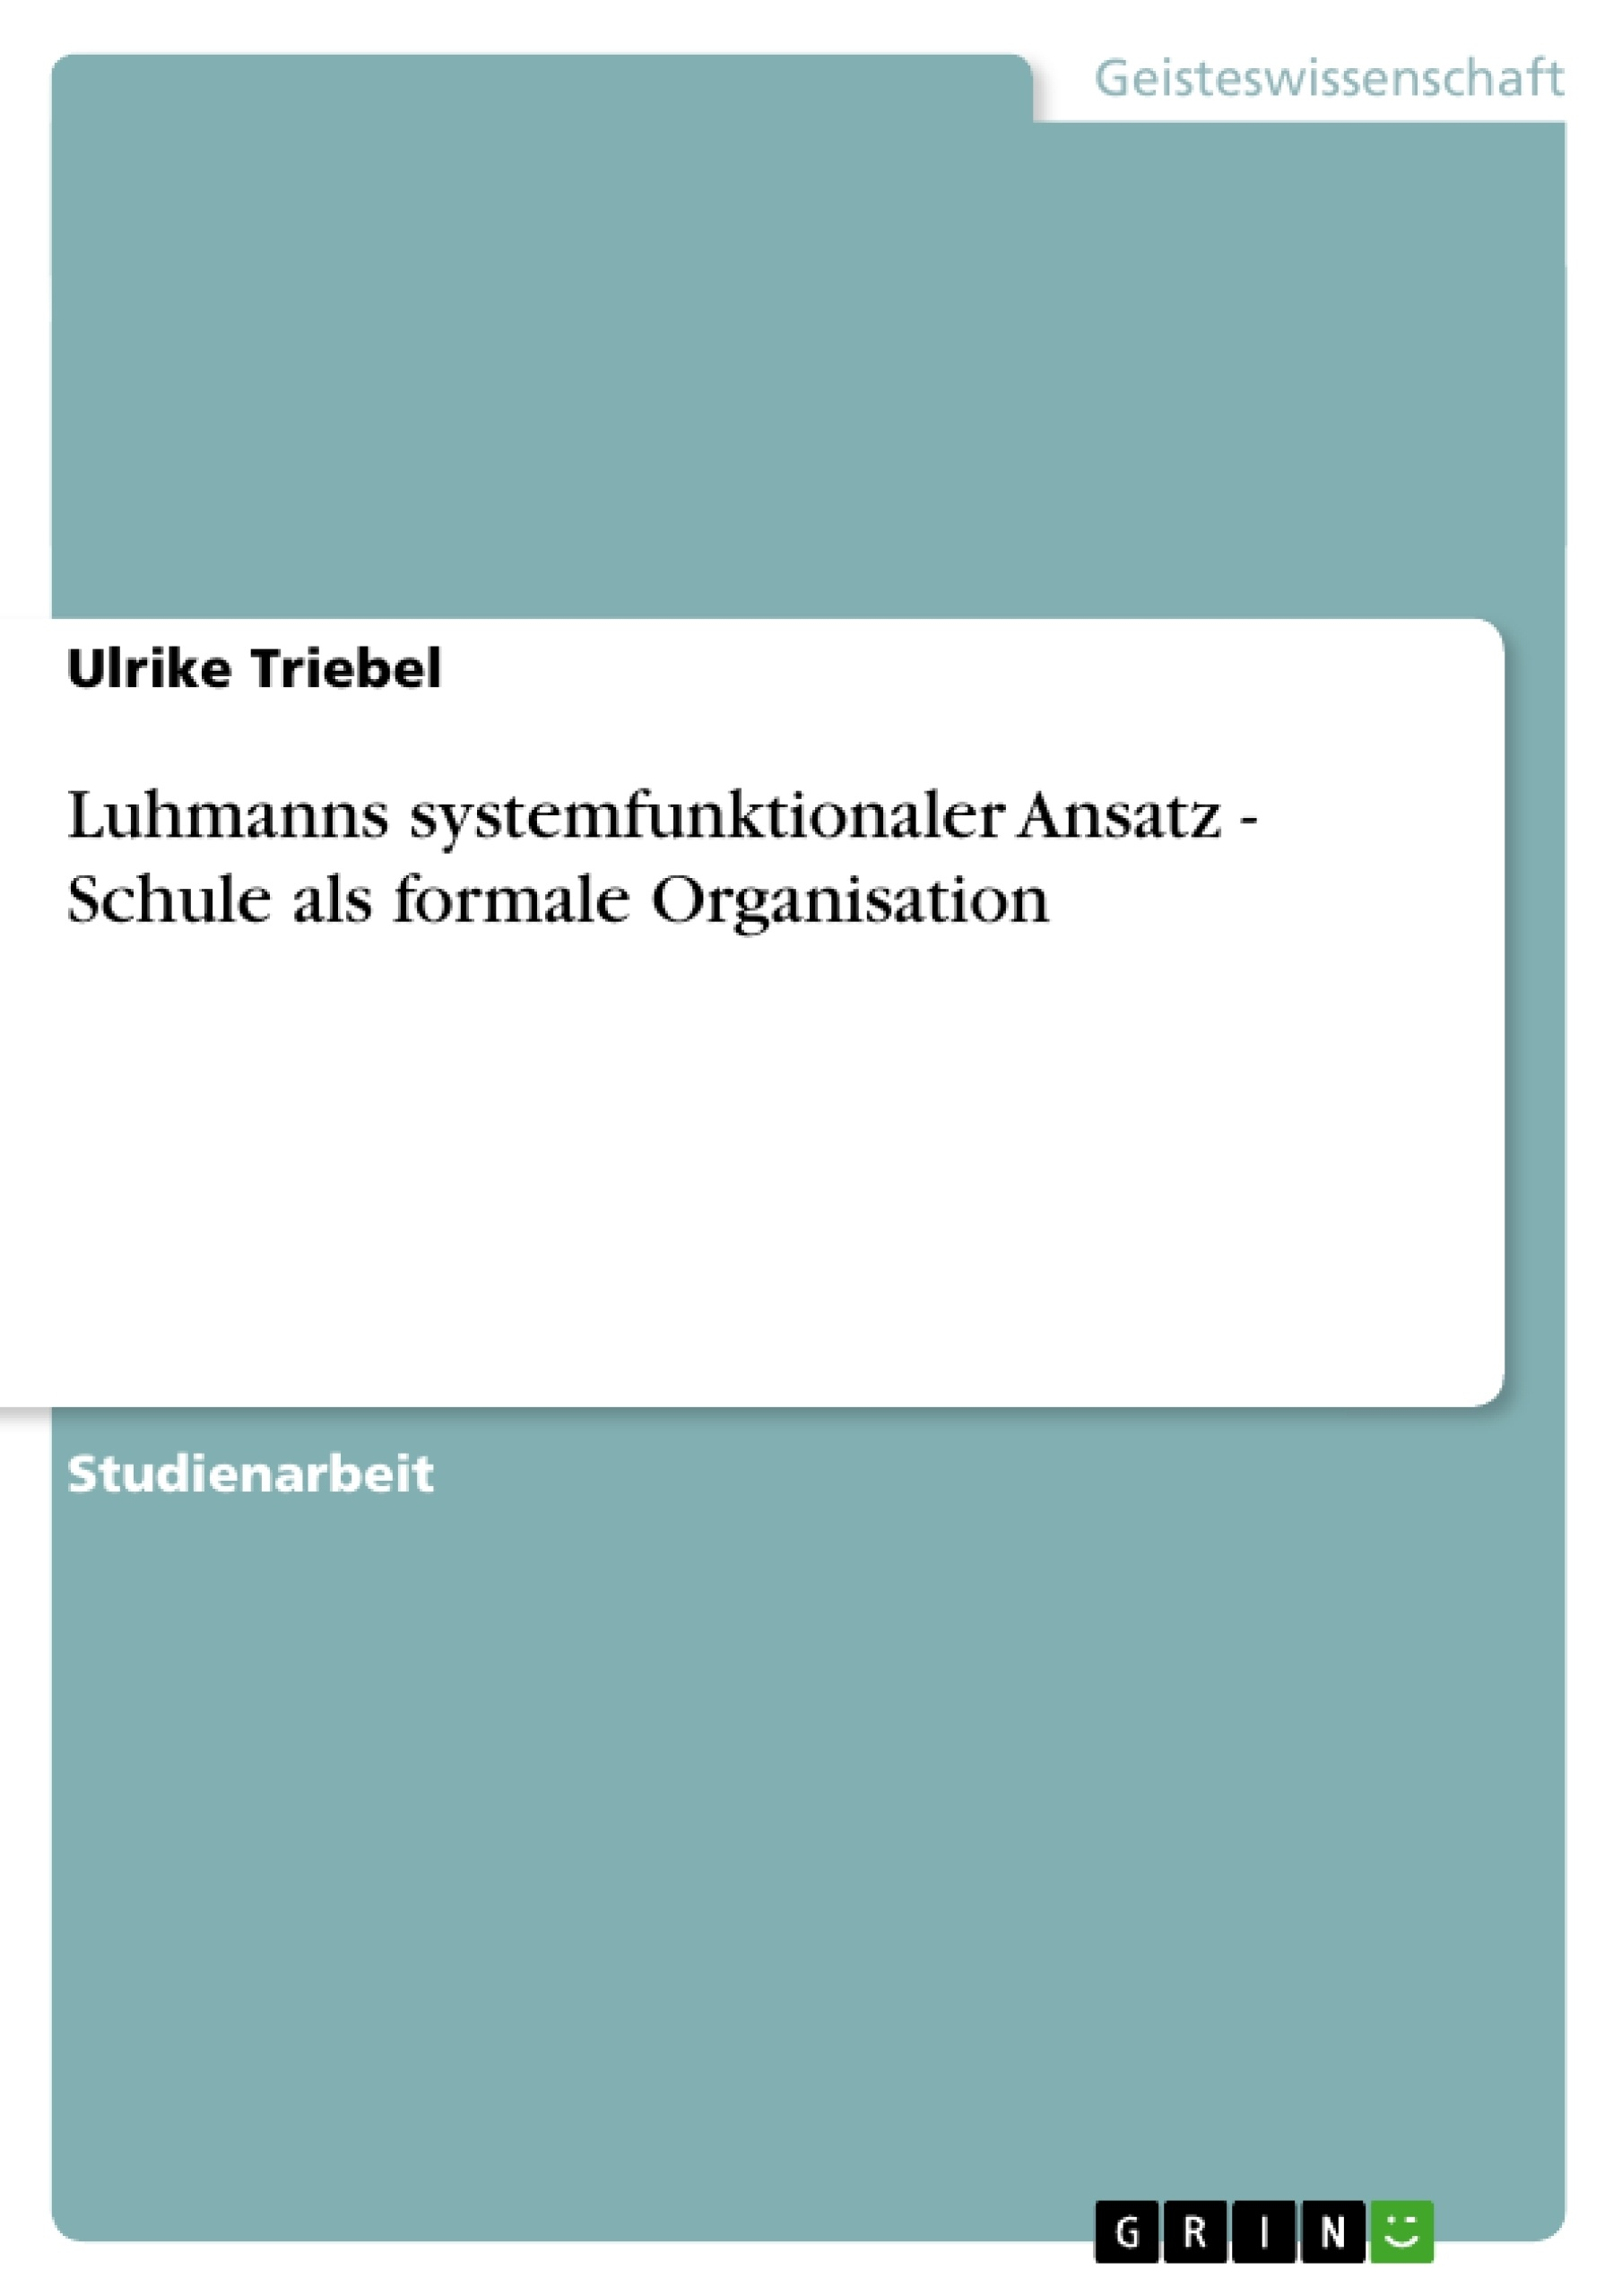 Titel: Luhmanns systemfunktionaler Ansatz - Schule als formale Organisation